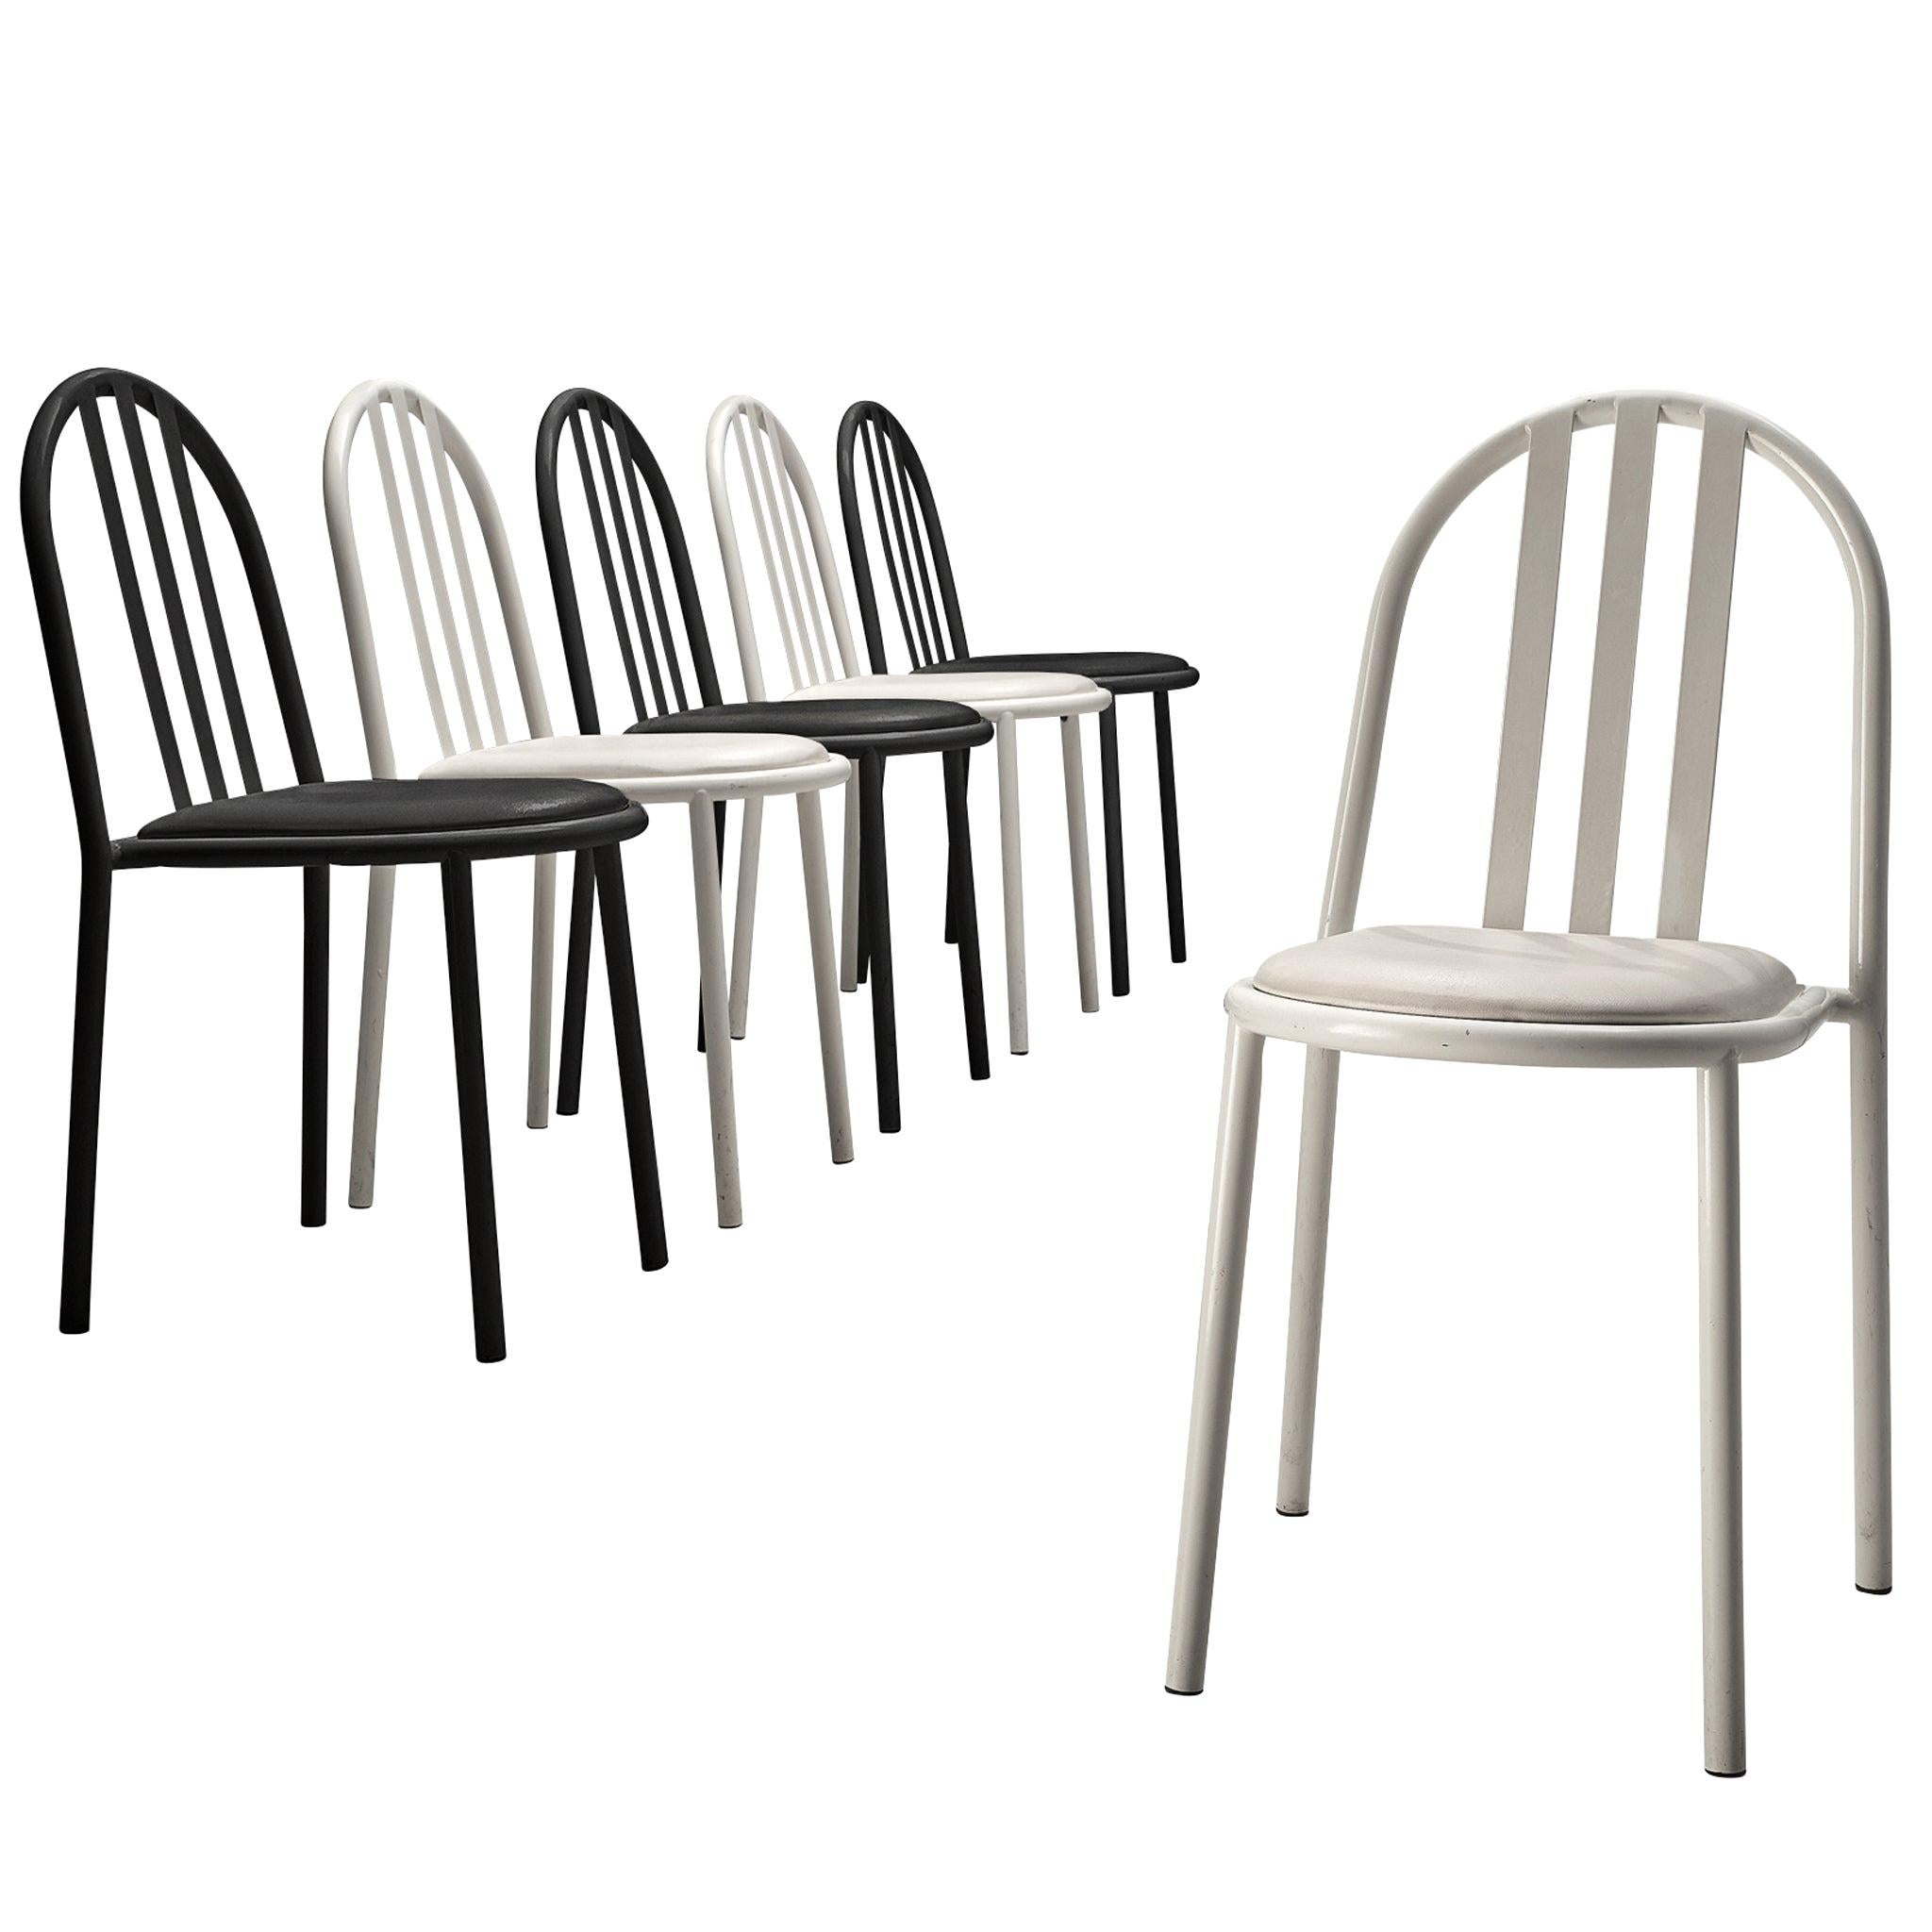 Robert Mallet-Stevens Bicolor Set of Six Tubular Steel Chairs